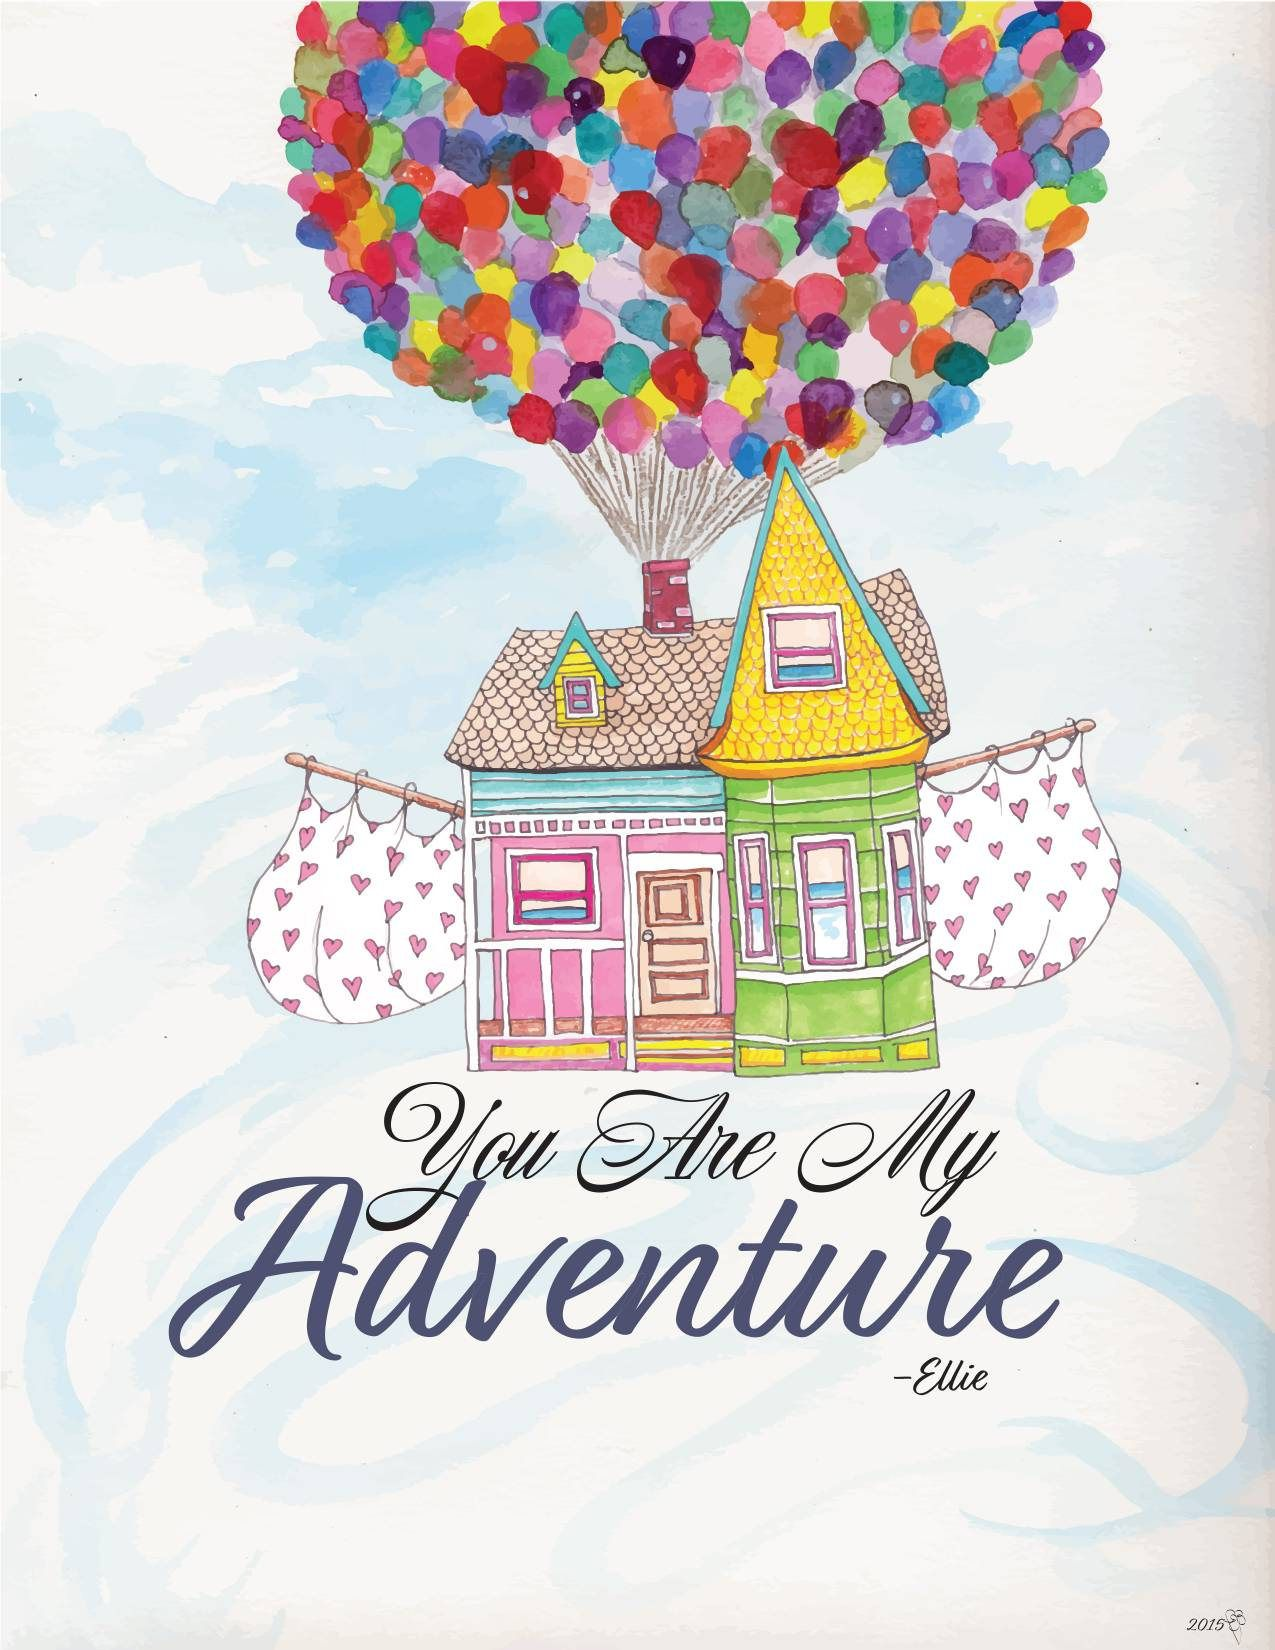 Pixar Up Adventure fine art illustration print Wall Poster